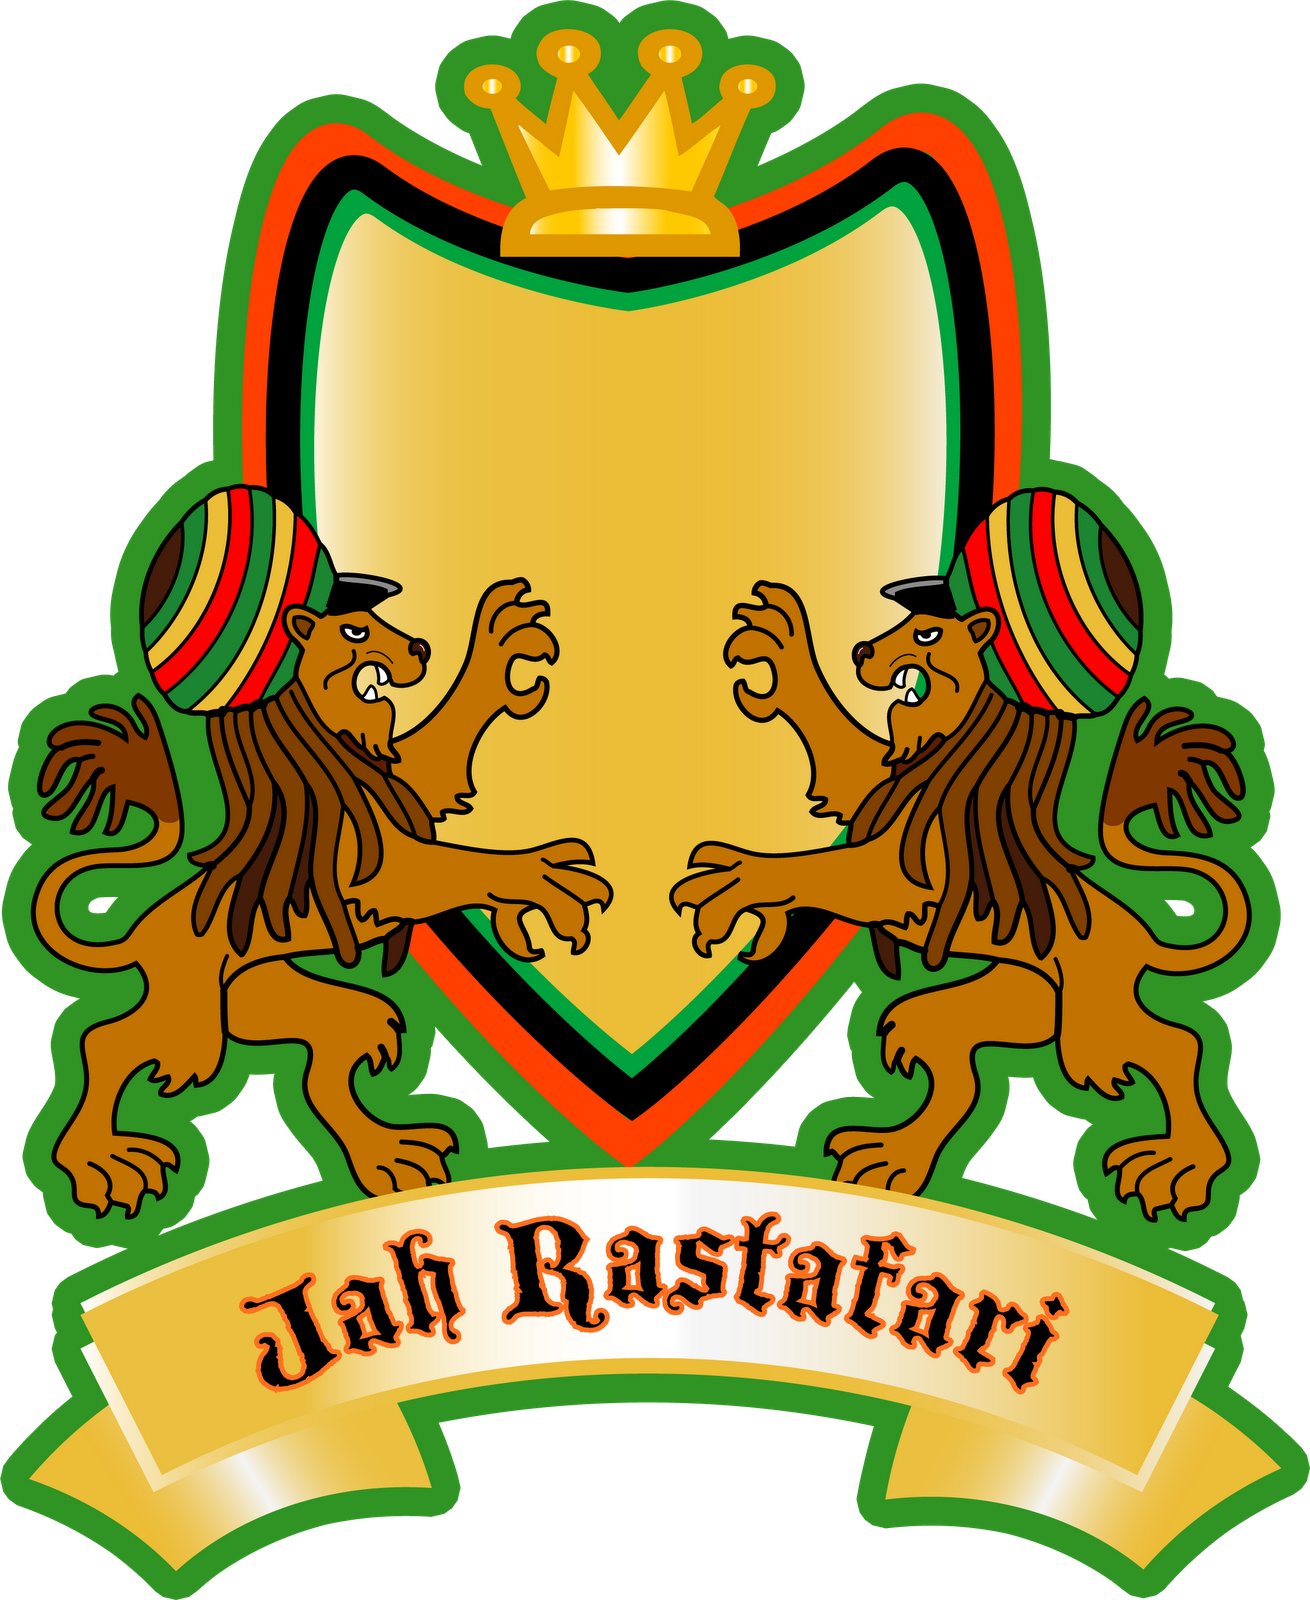 jah rastafari prayer With Quotes Hd Squidoo Wele To